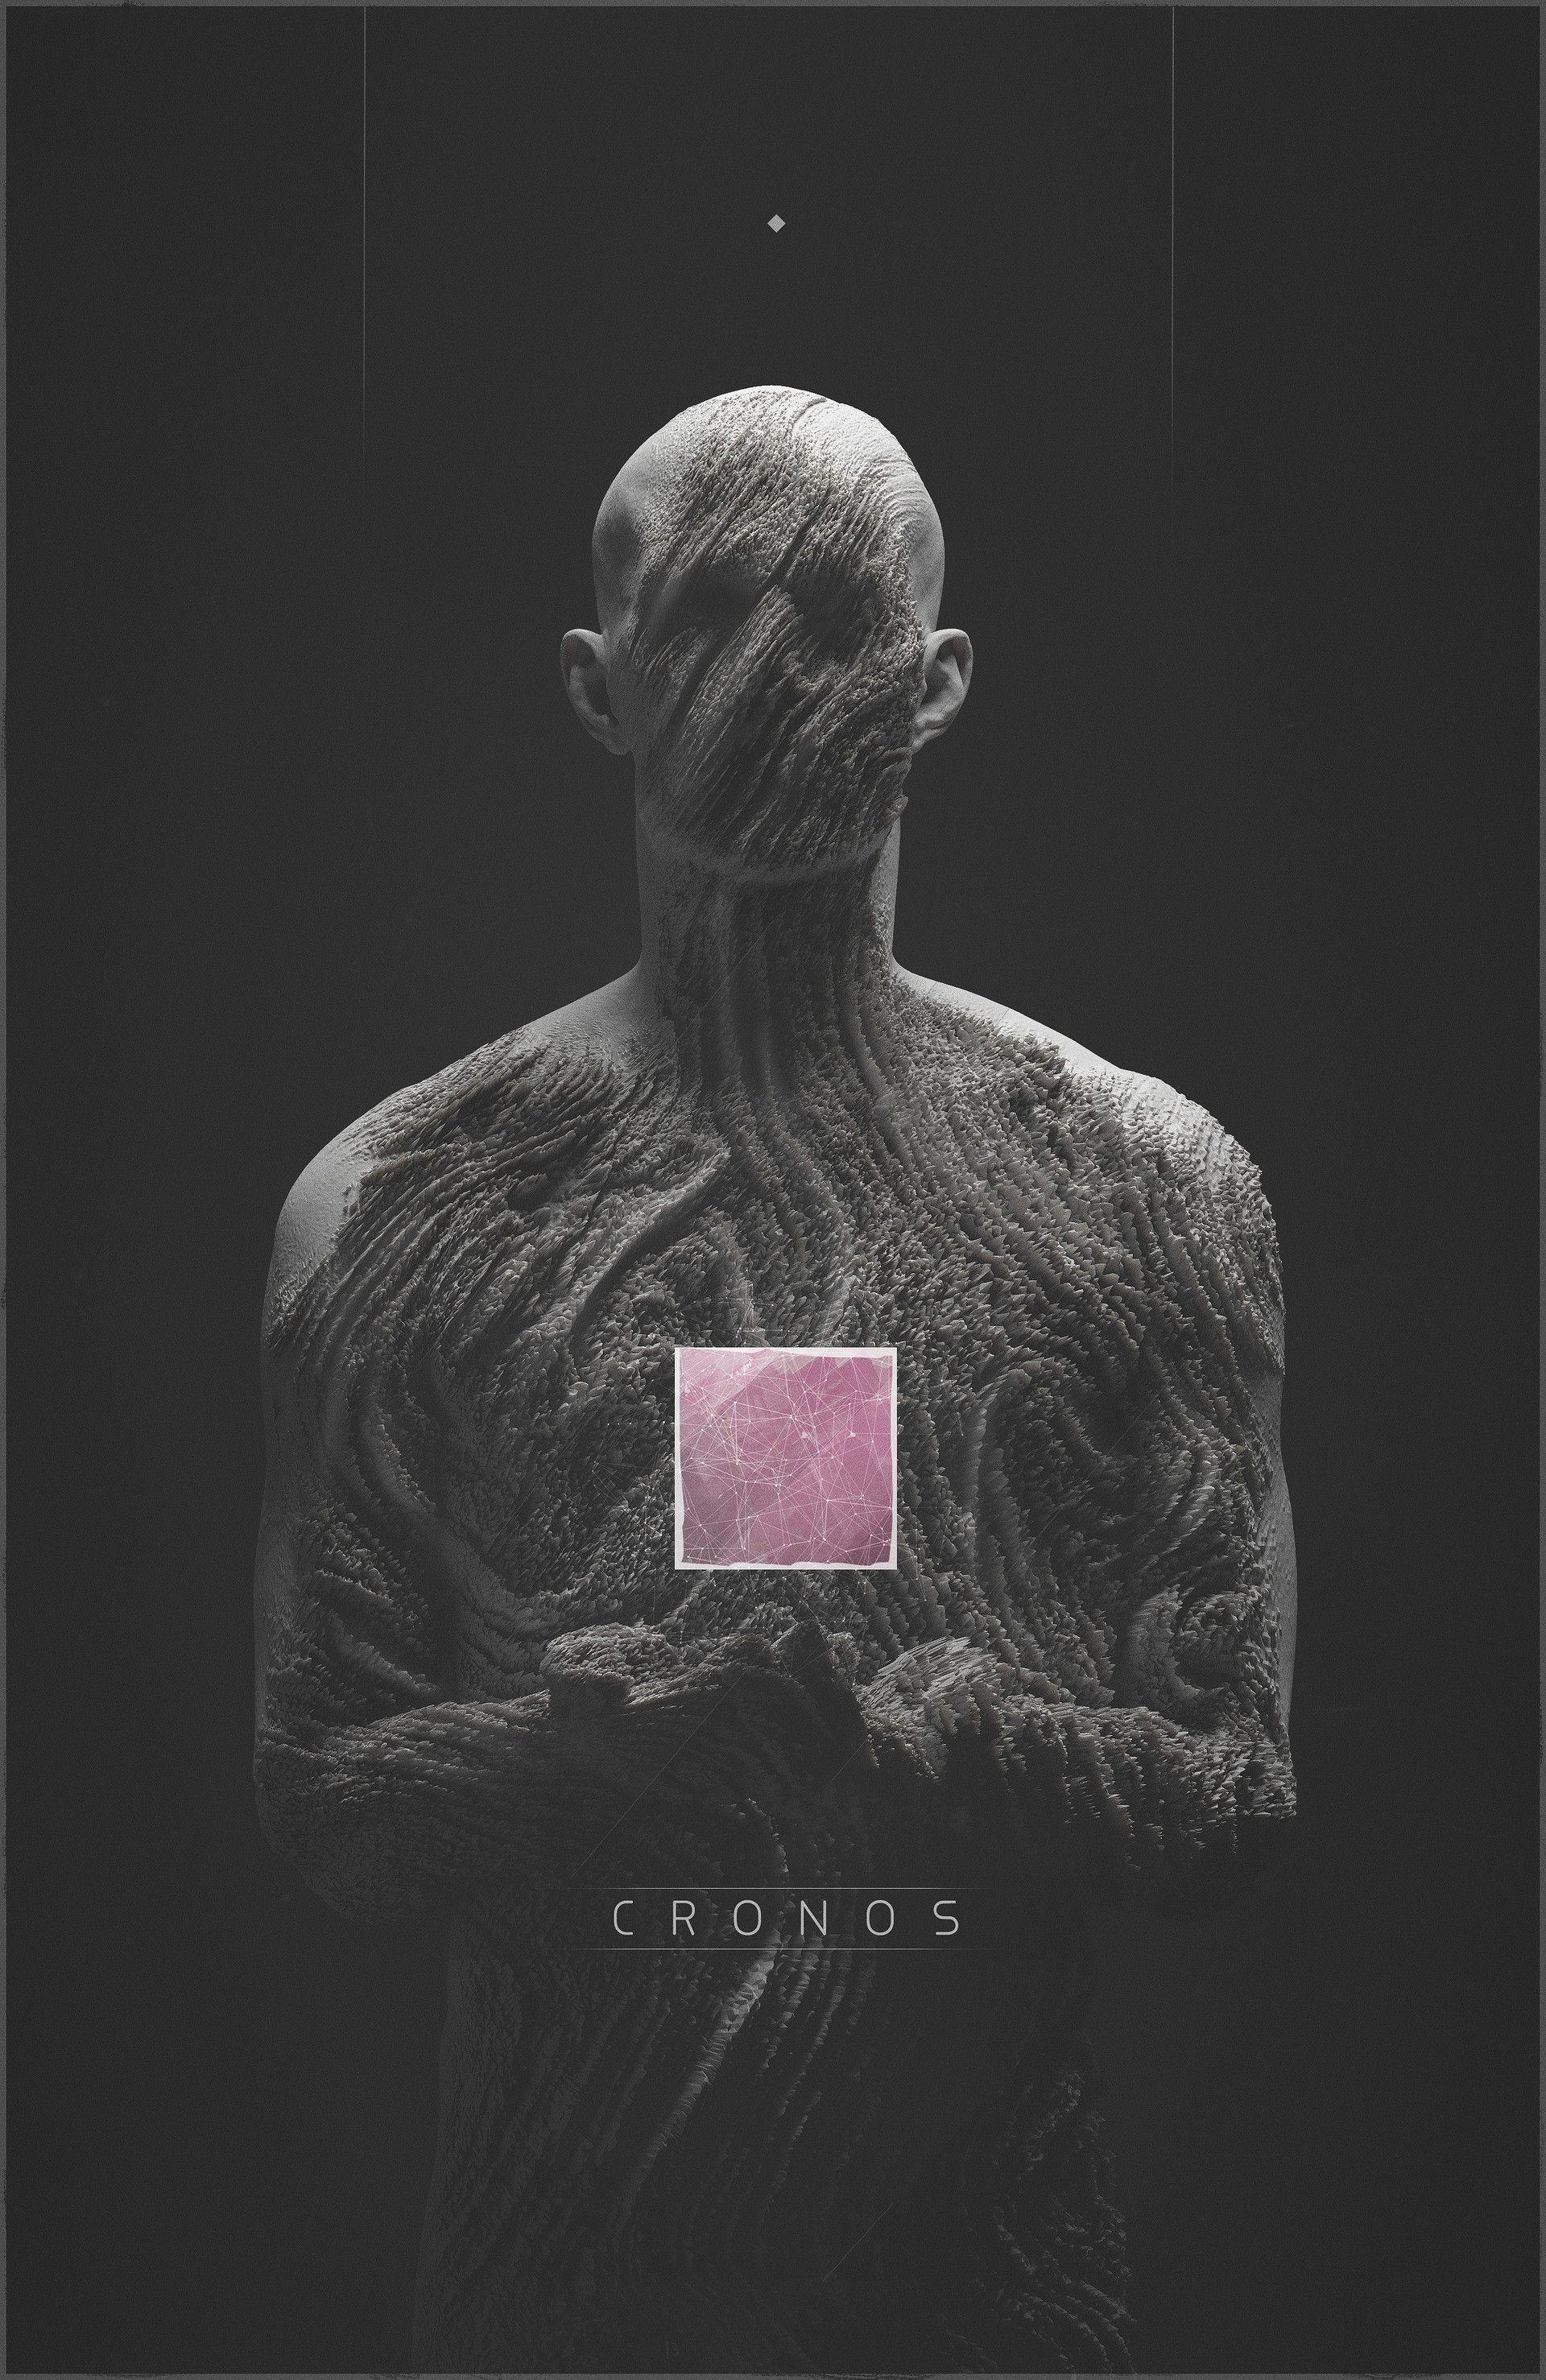 ArtStation - CRONOS 013, Philip Harris-Genois